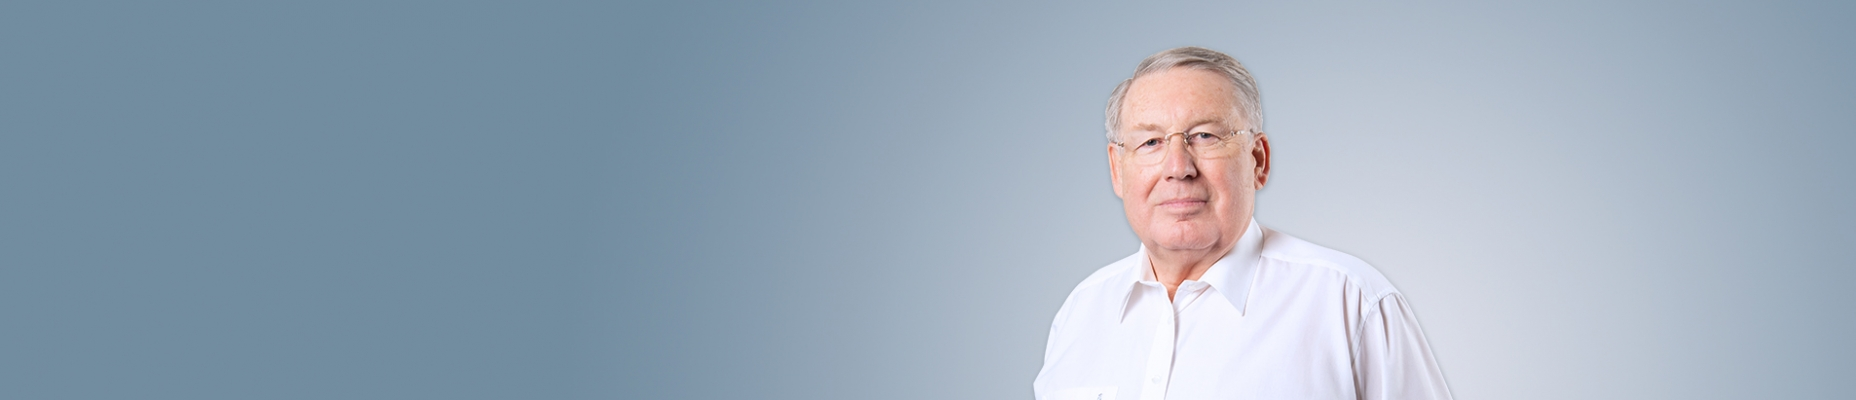 MedBaltic_Header_Joachim_Paulsen